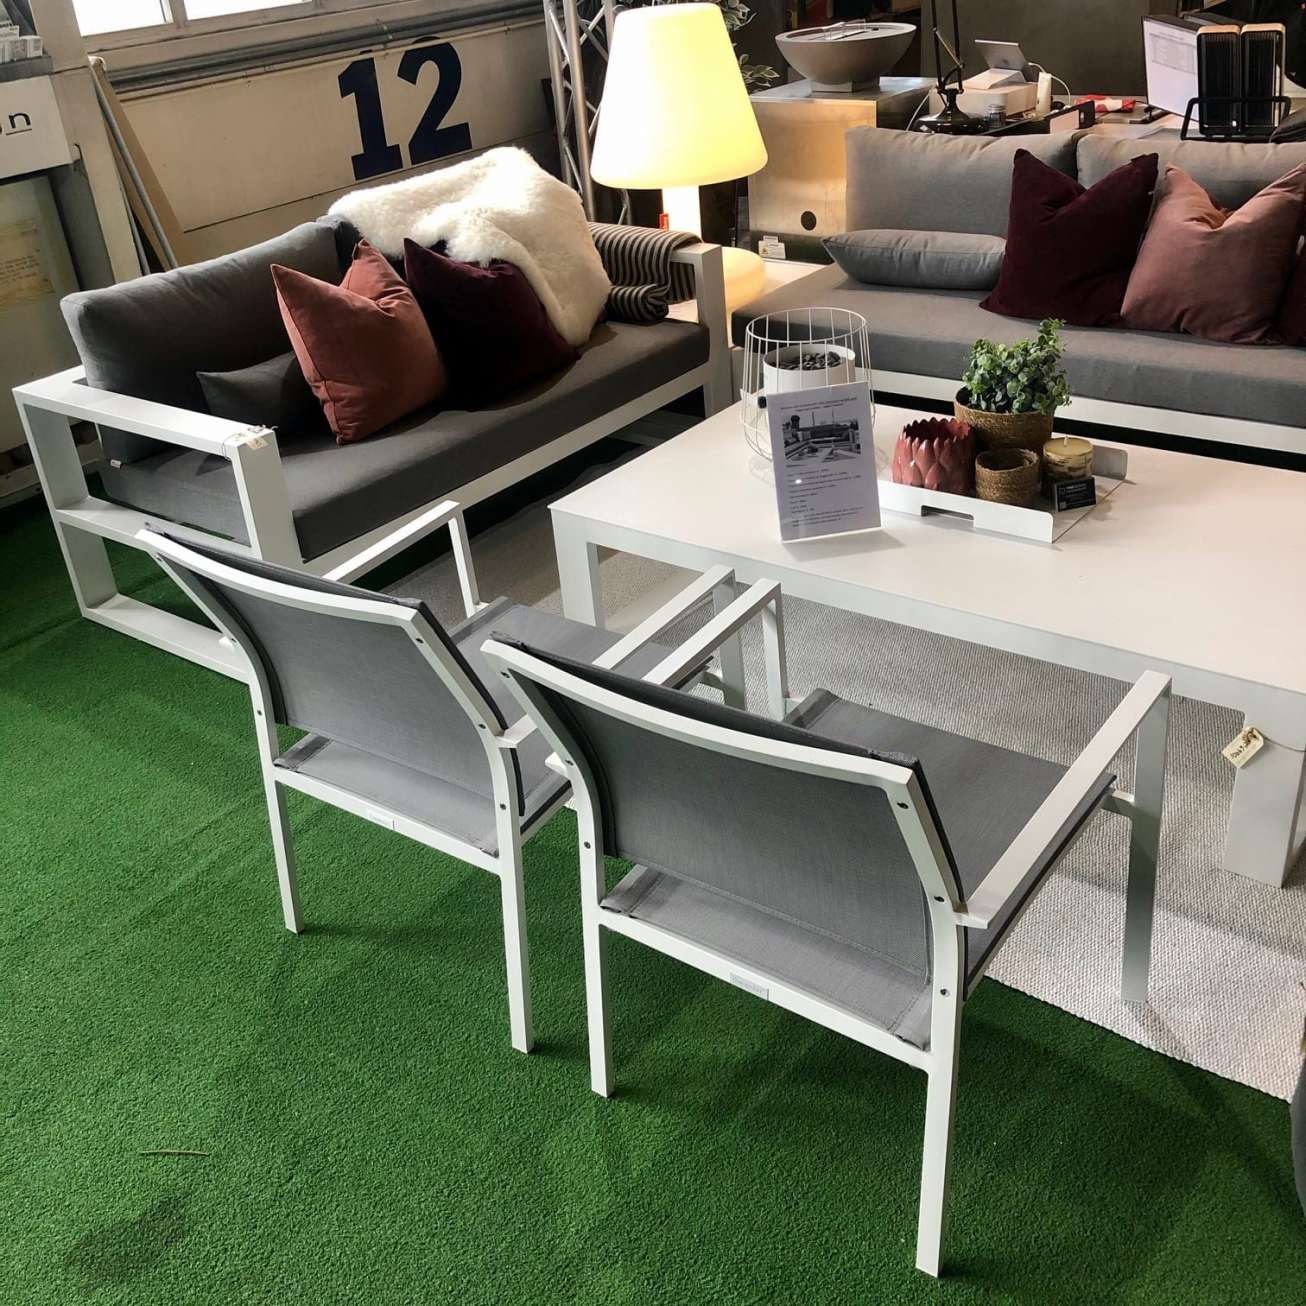 Gardenart Loungestol Hvit/grÅ, Stablebar (100575) Hagemøbler og utemøbler - Fine design